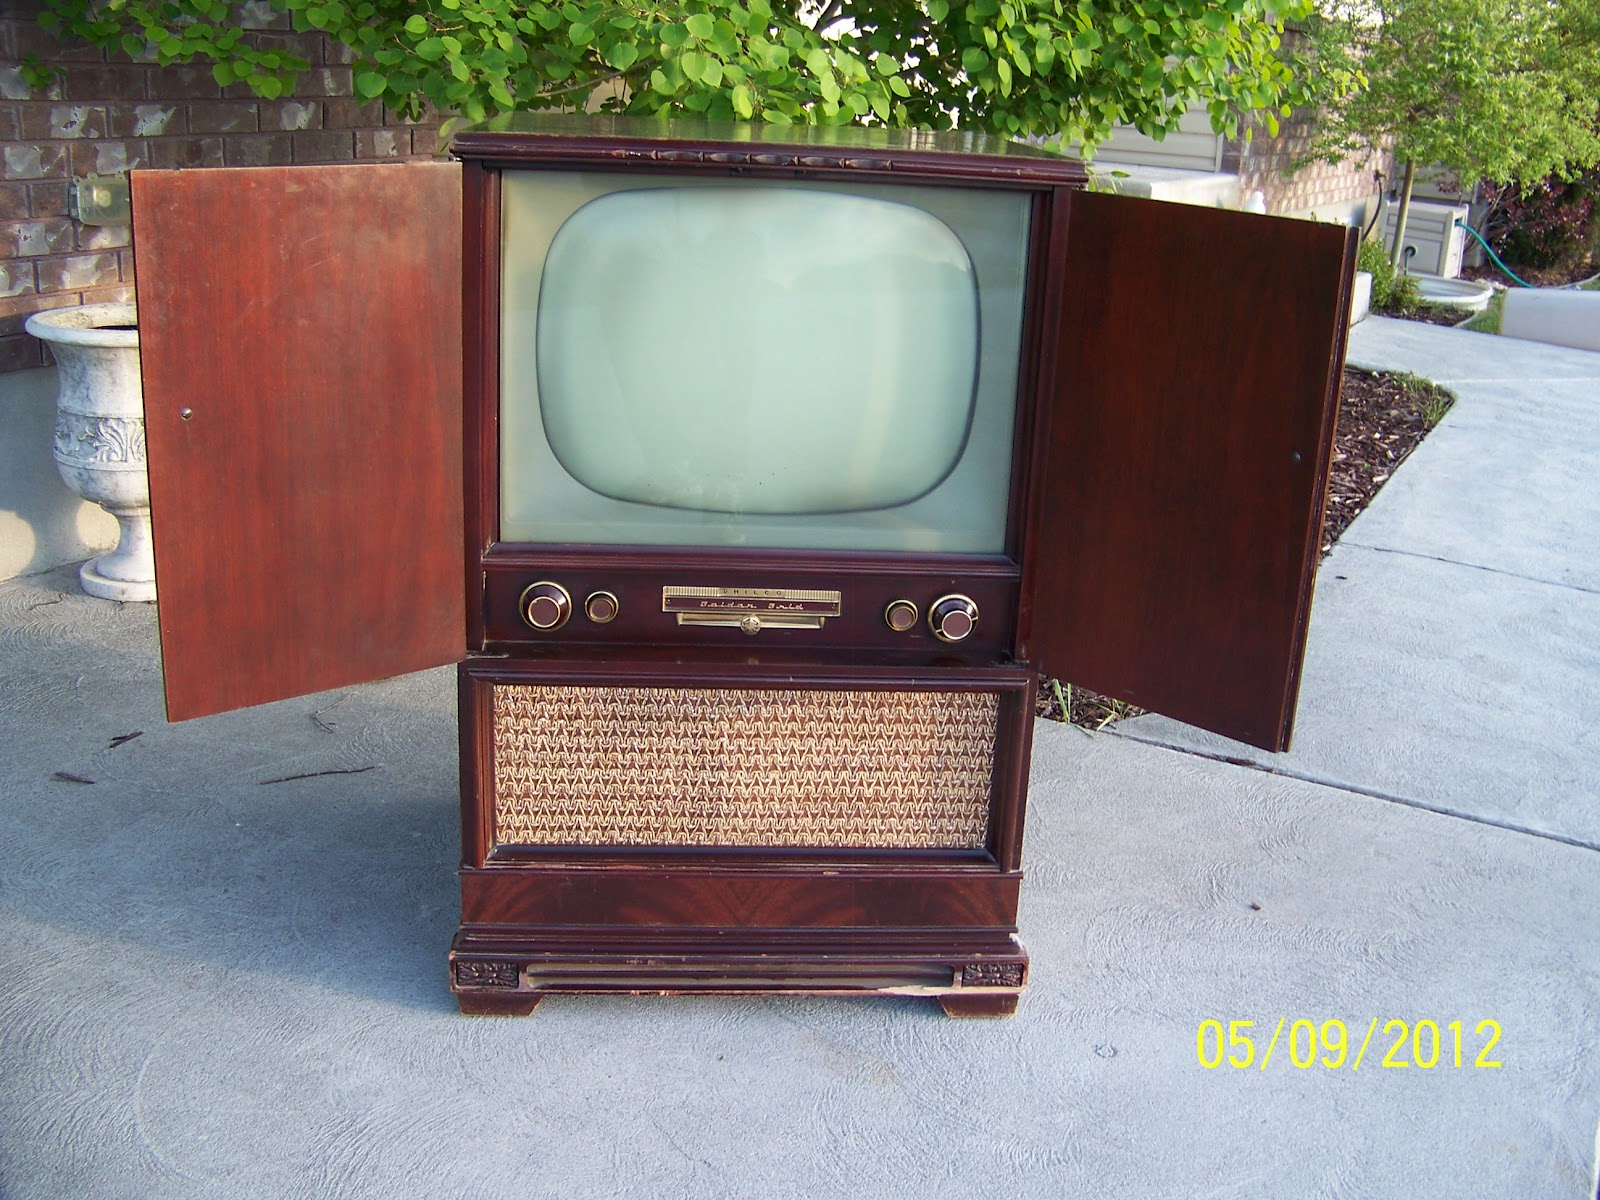 conant ball chair childrens desk and set sri lanka ~ annie's drab 2 fab ~: vintage philco tv cabinet